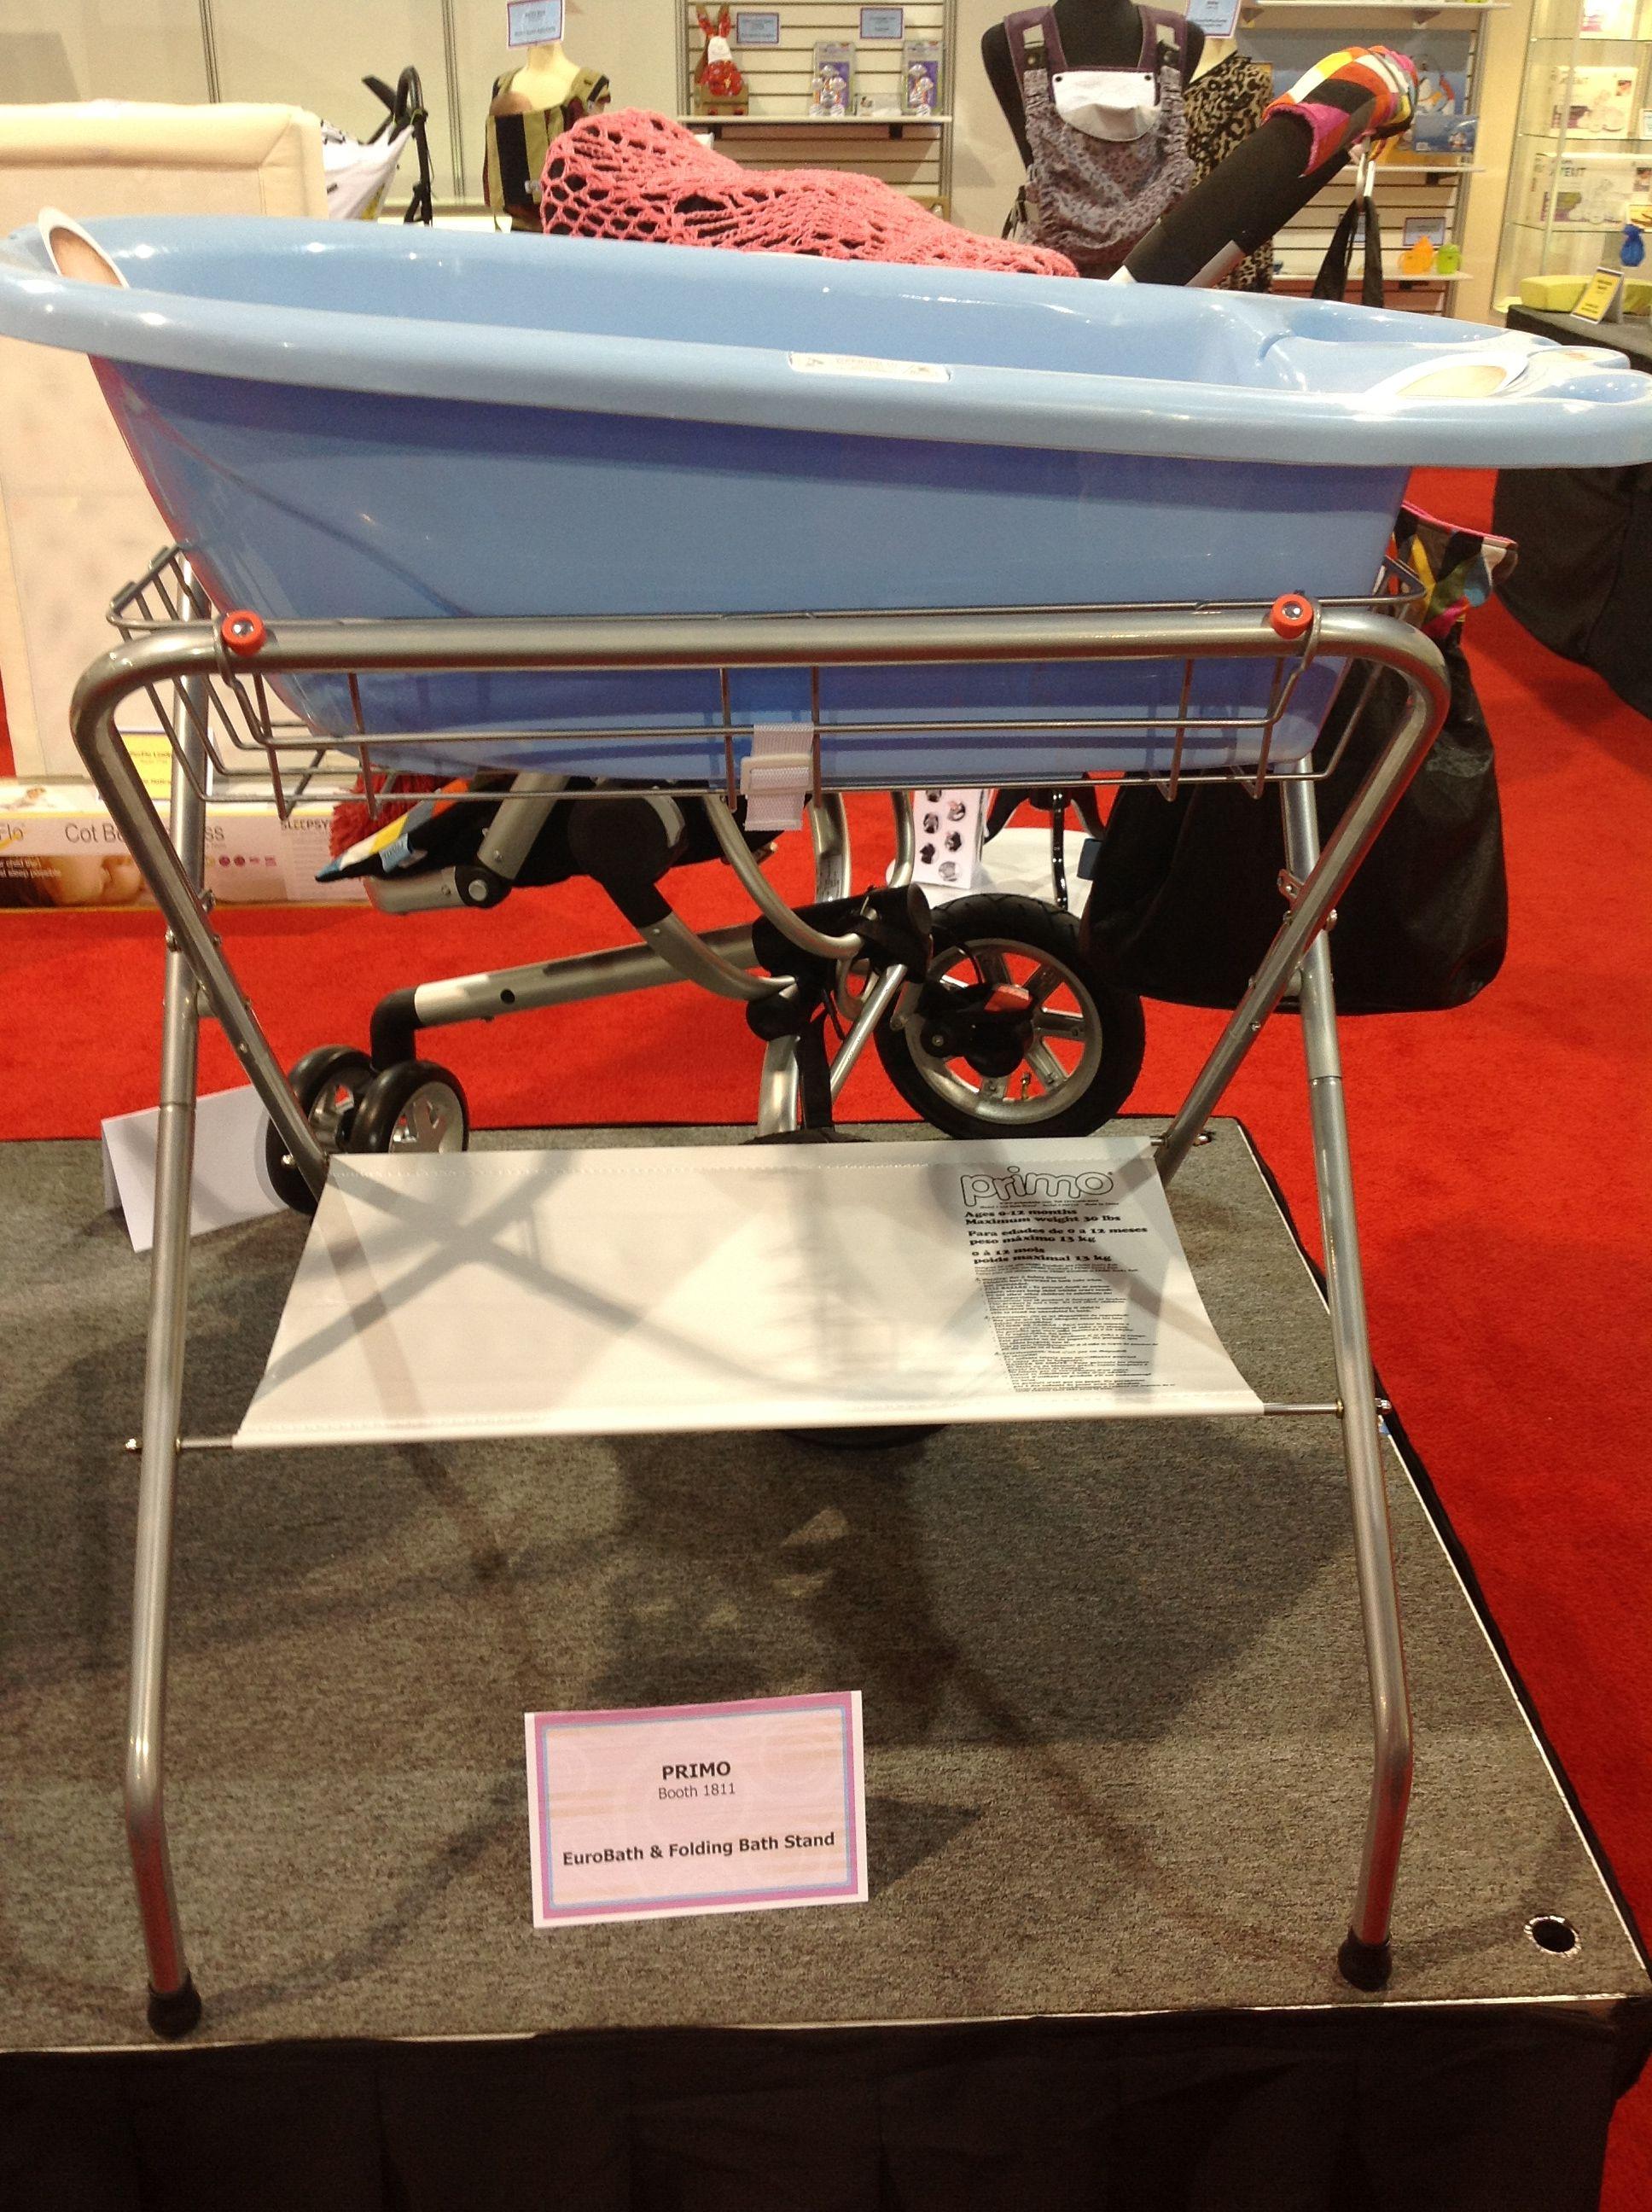 Primo EuroBath & Folding Bath Stand | 2013 New Product Showcase ...